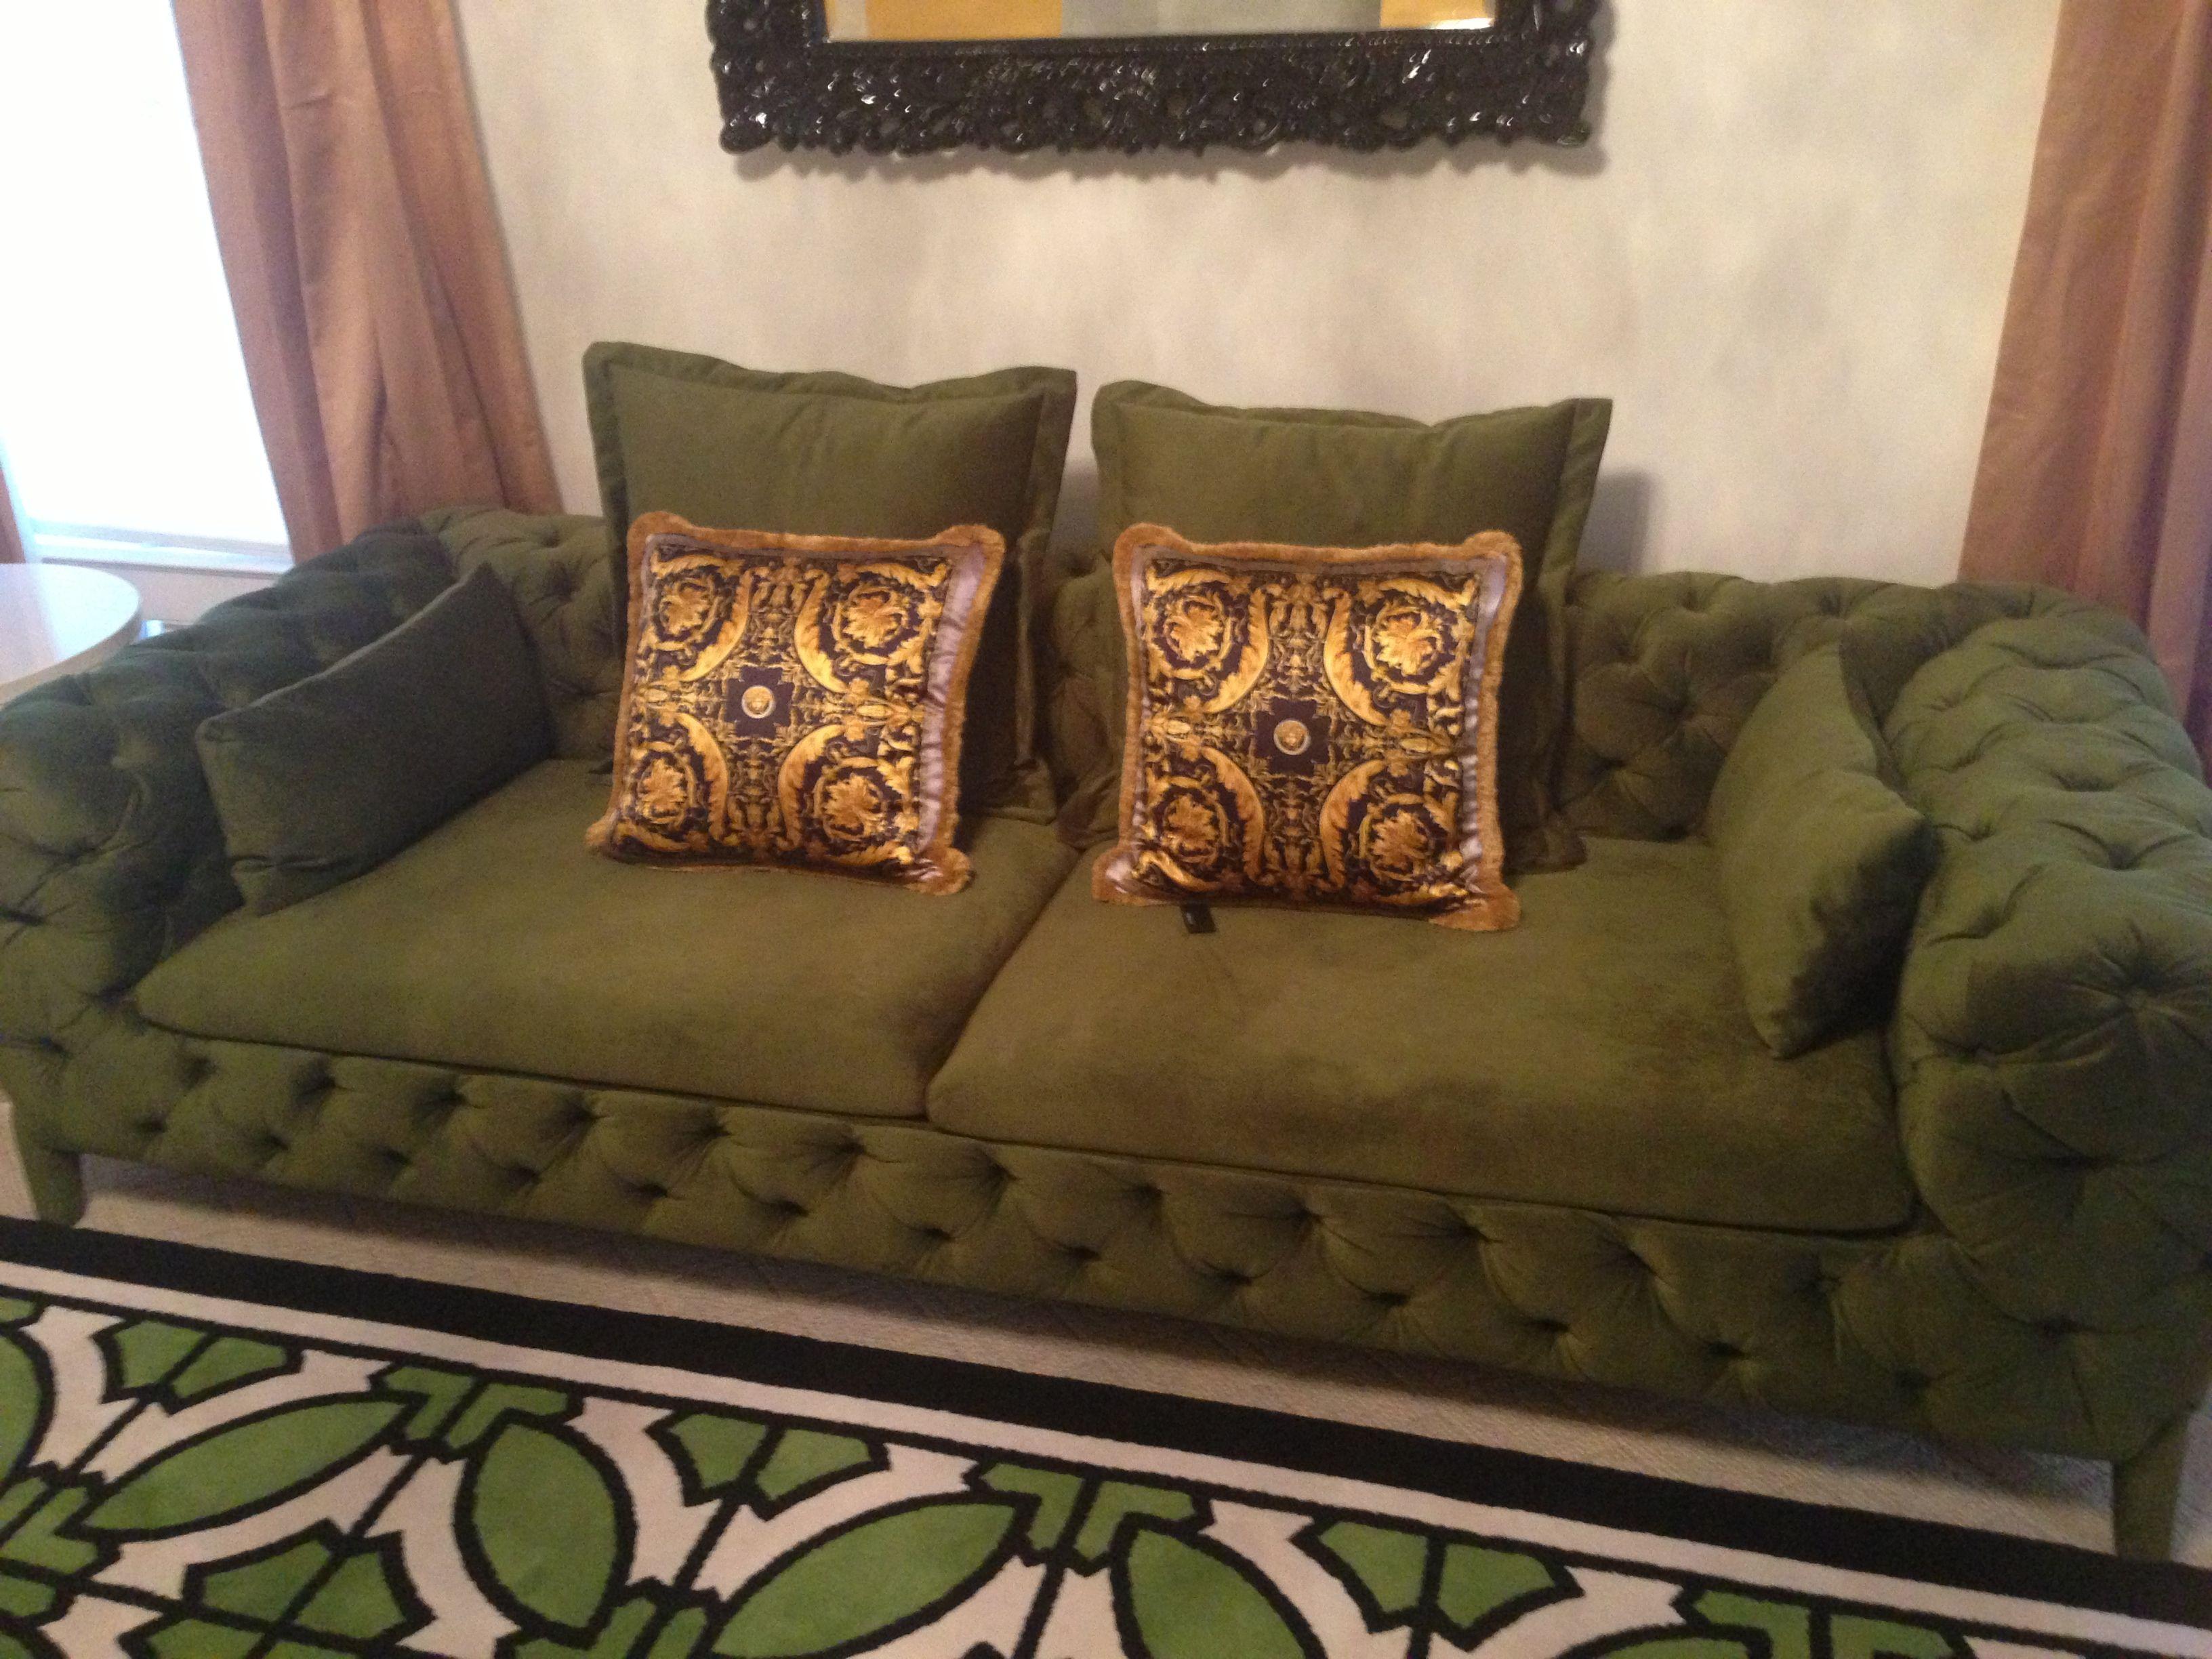 Versace Pillows And Atlanta Lifestyle Furnishing Tufted Sofa And Custom Rug Tufted Sofa Custom Rugs Furnishings #versace #living #room #rug